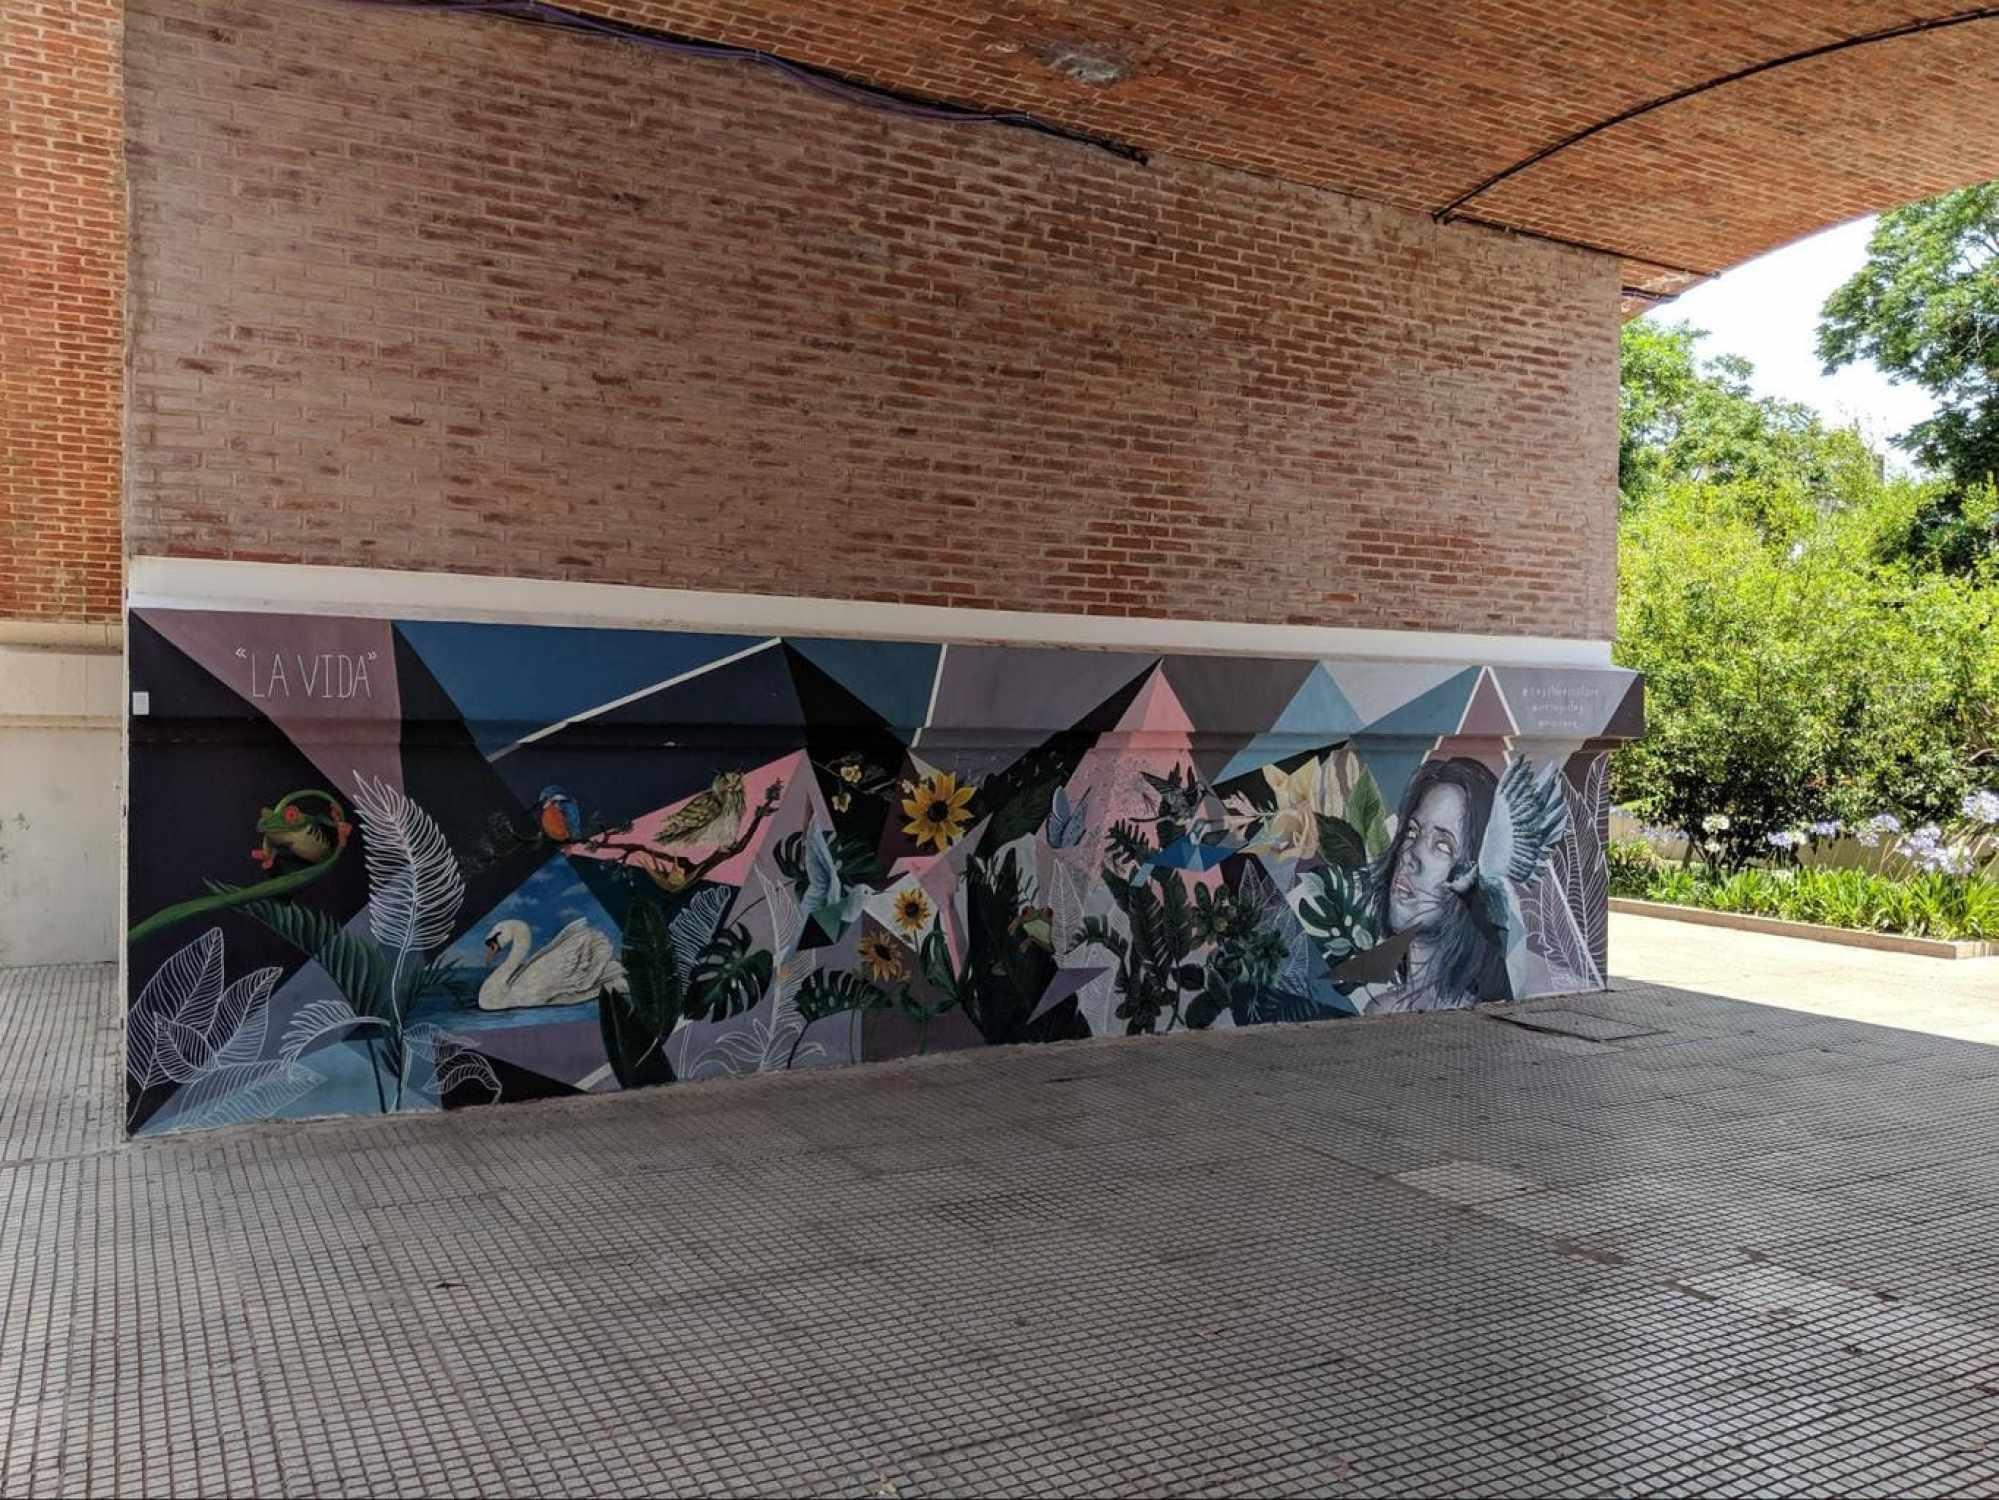 Taking a stroll at Los Arcos del Rosedal